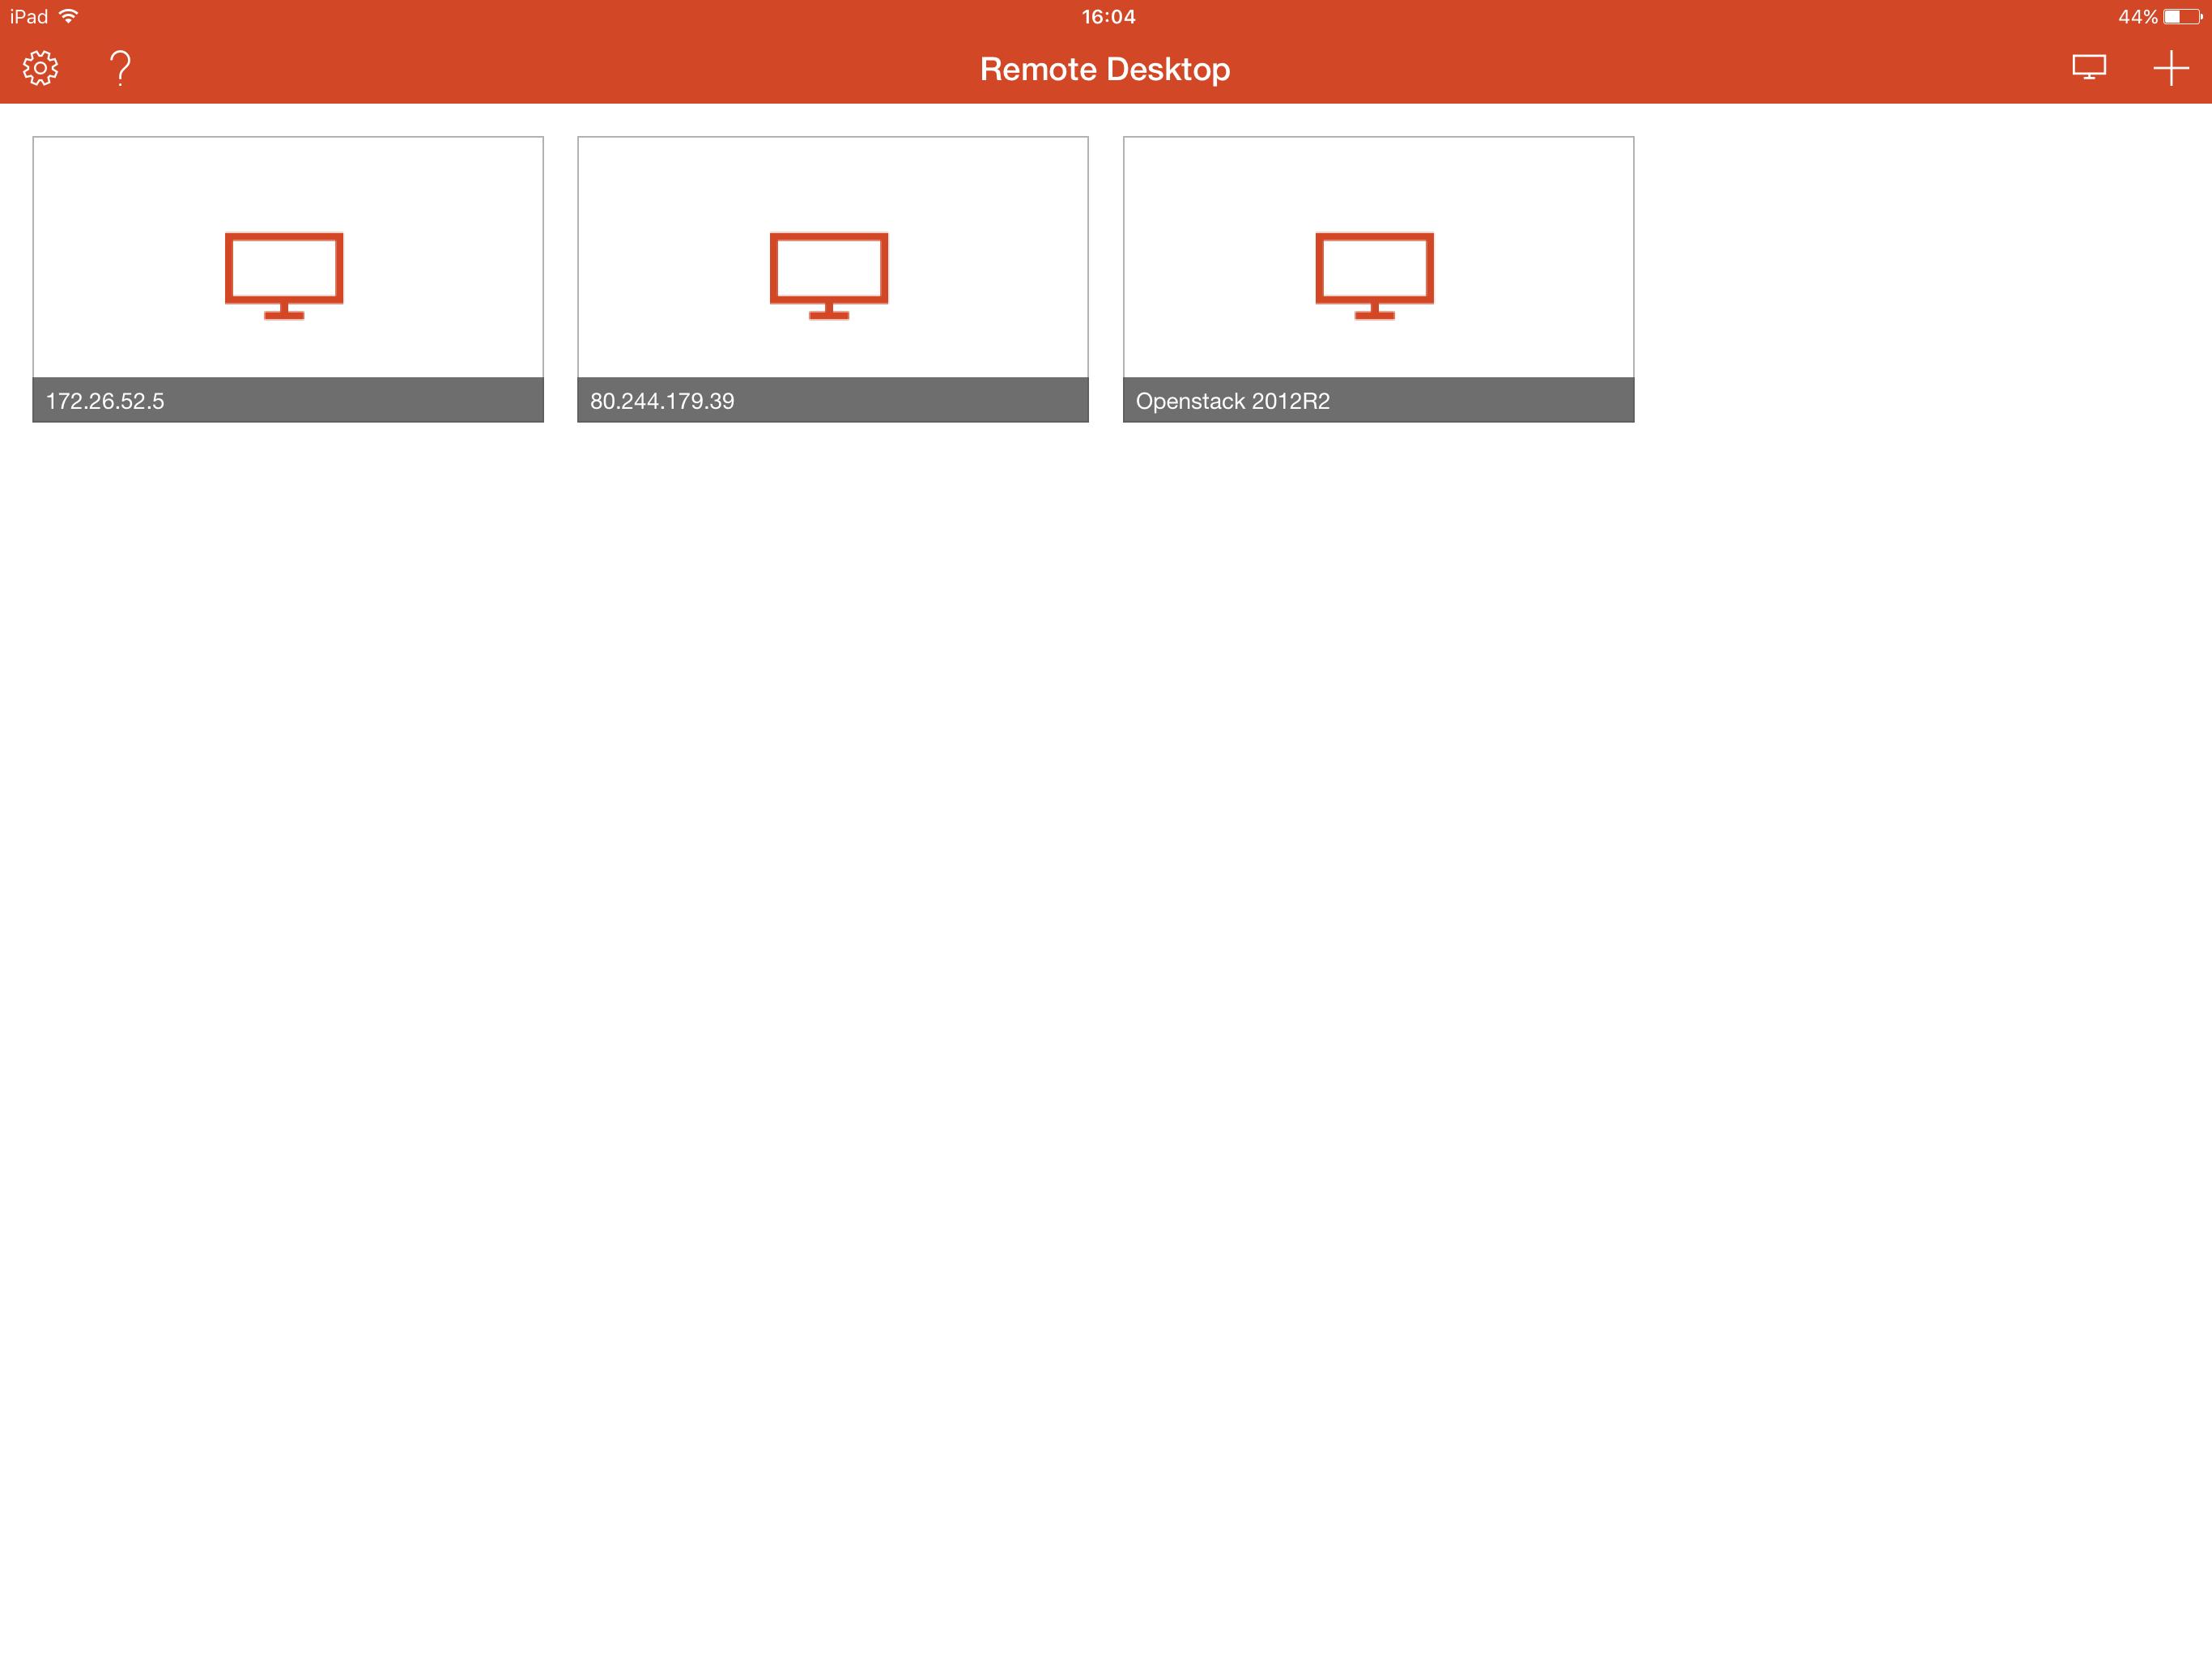 Connecting to a server via Remote Desktop